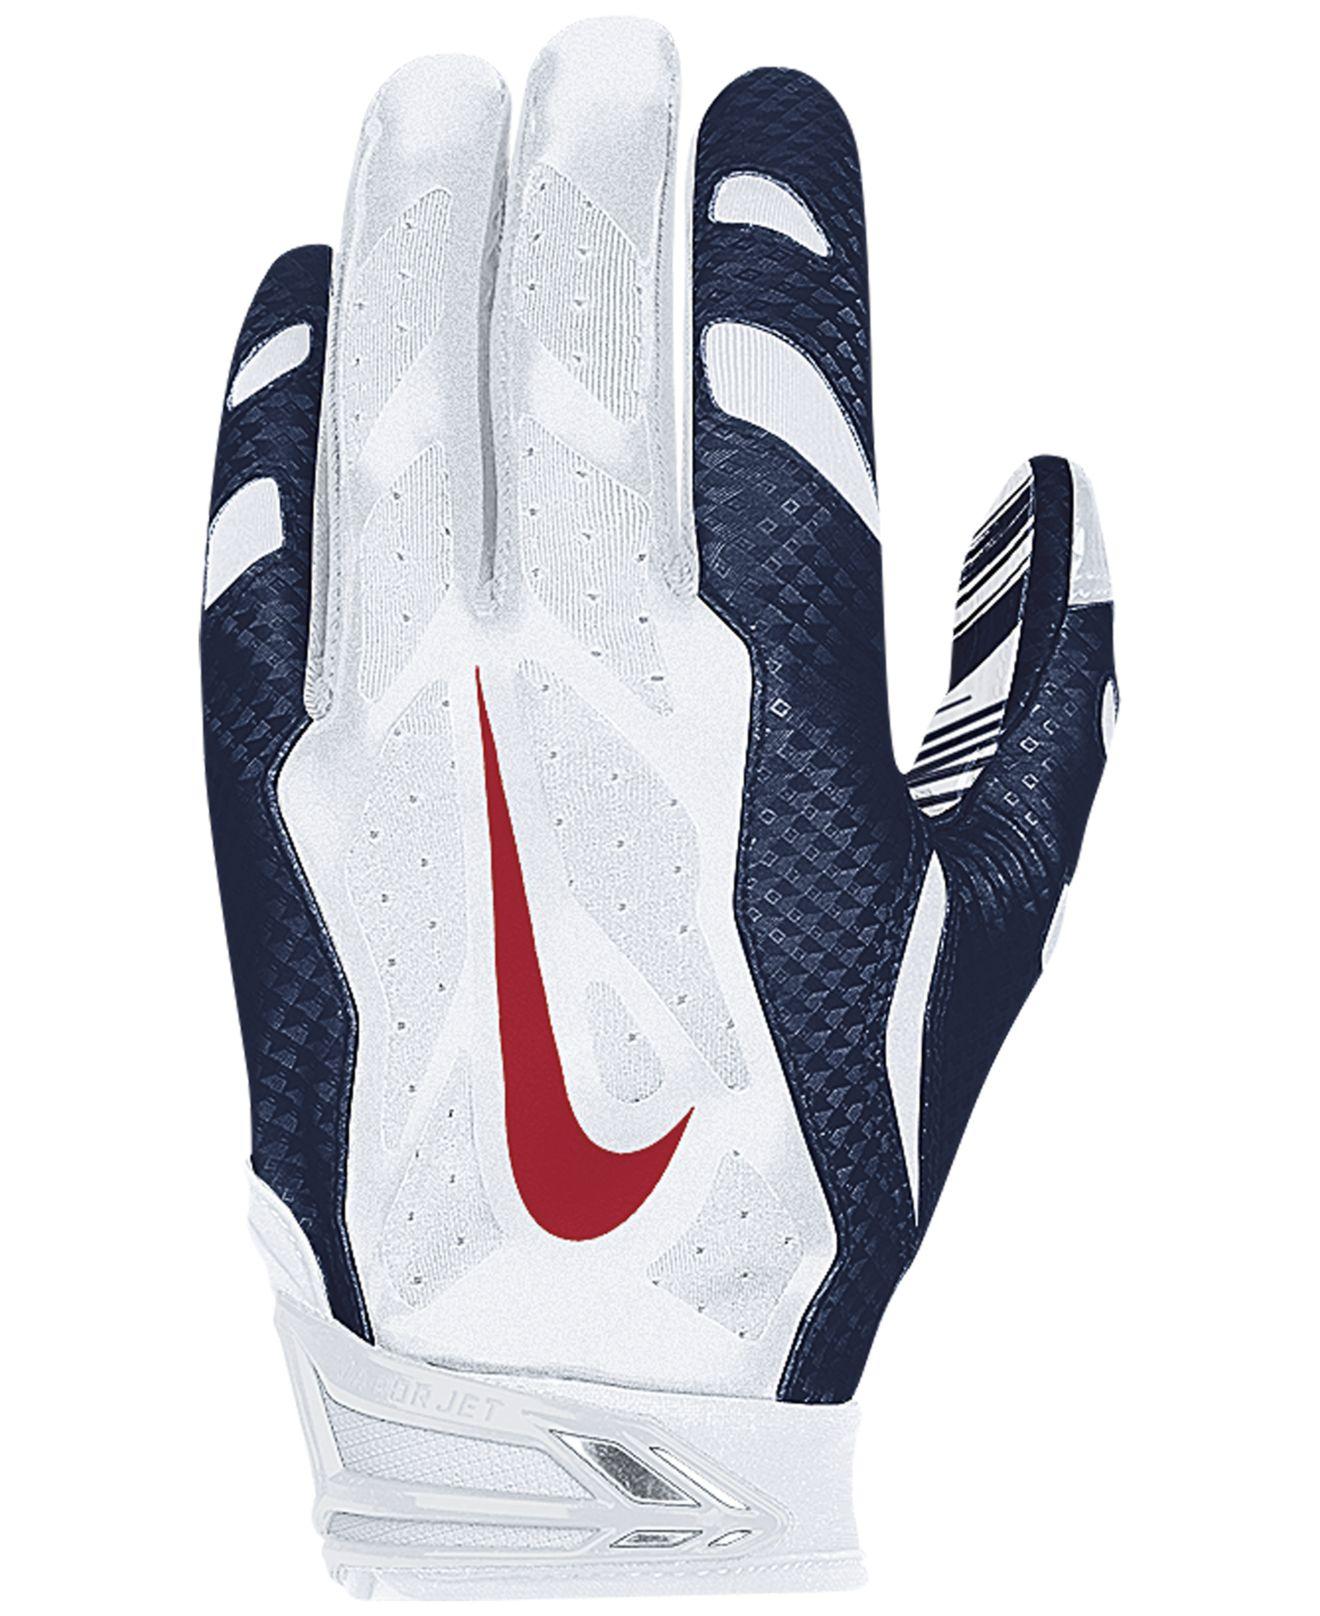 Lyst - Nike New England Patriots 30 Vapor Jet Gloves in Blue for Men 0317e2b6ee